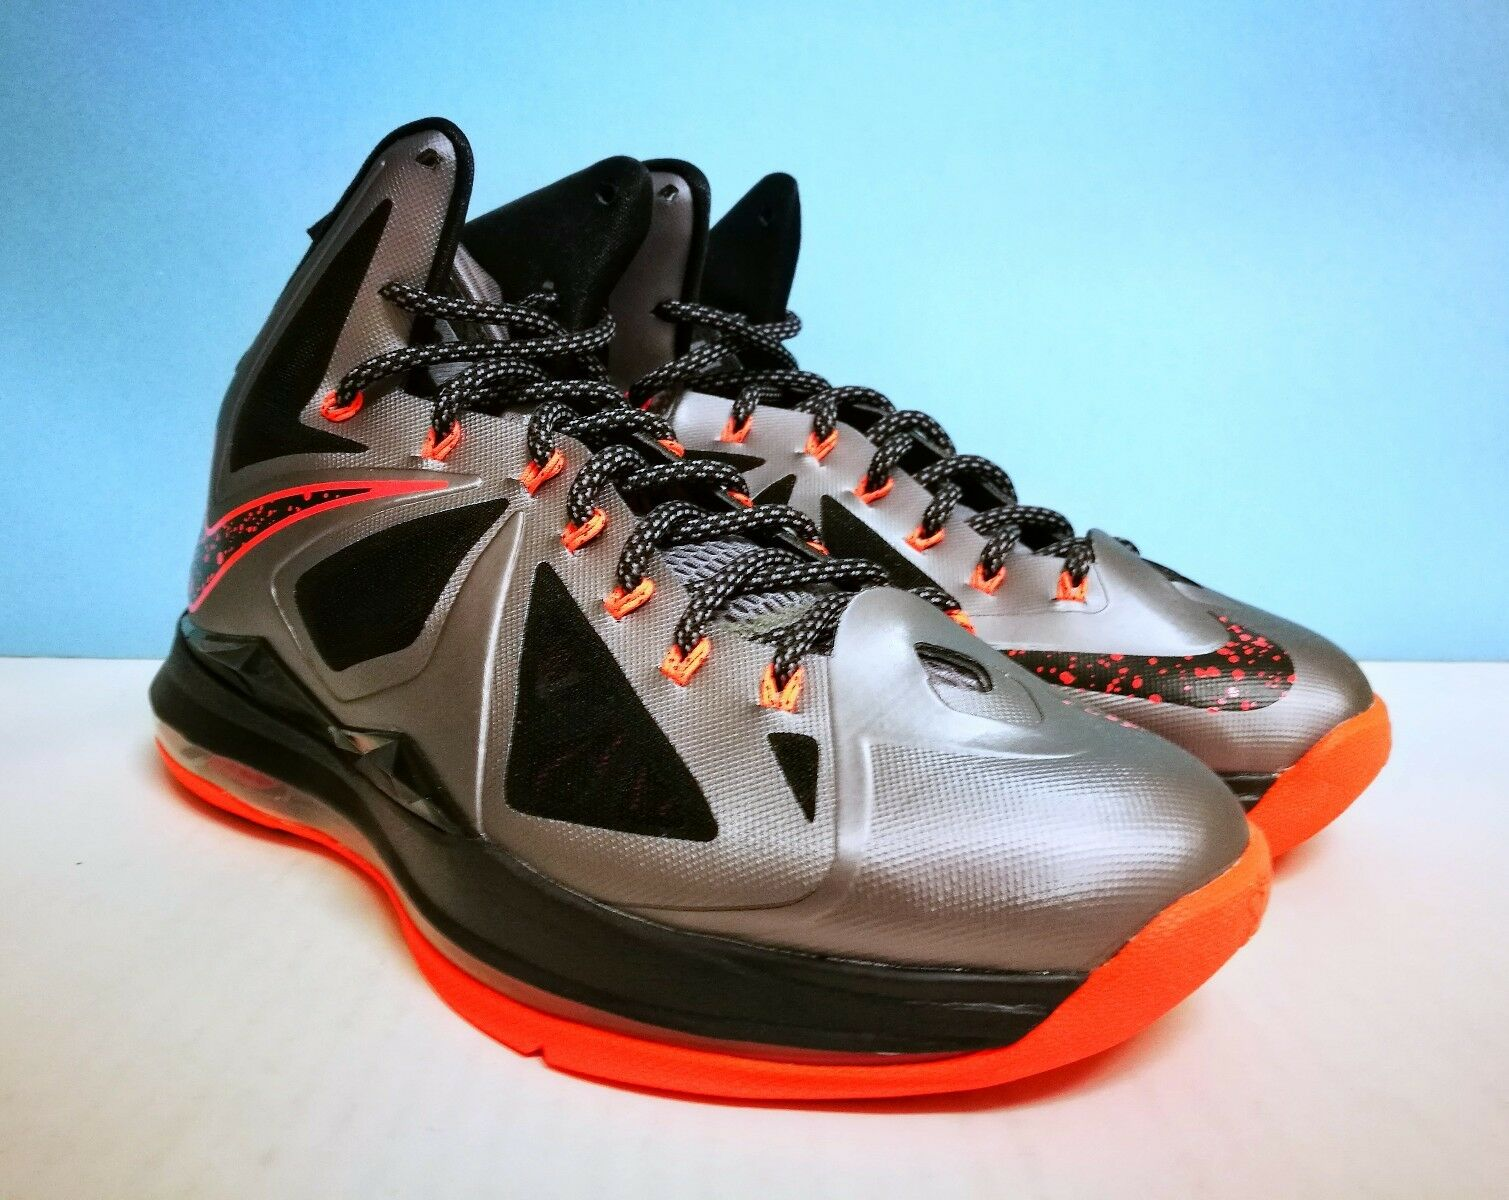 Nike Lebron X (10) 9 ++ LAVA ++ sz 9 (10) US 42.5 Jordan kobe kd Adidas 5e6658